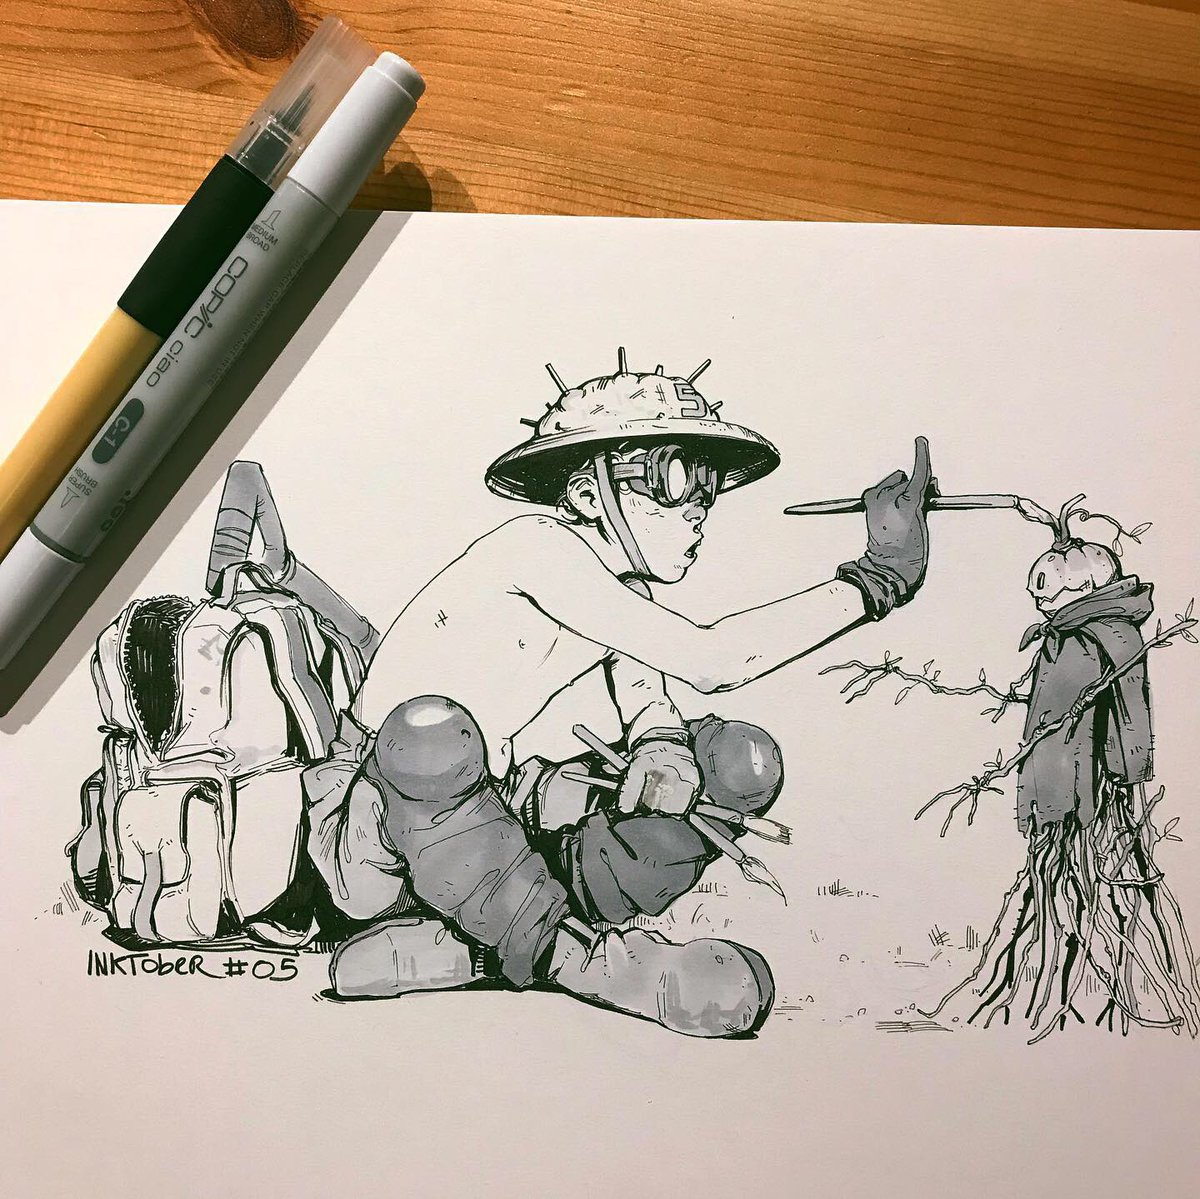 Bunch of drawings that I did a while ago!  #Inktober #art #artwork #sketchbook #sketchpic.twitter.com/lLIeIWOU4u